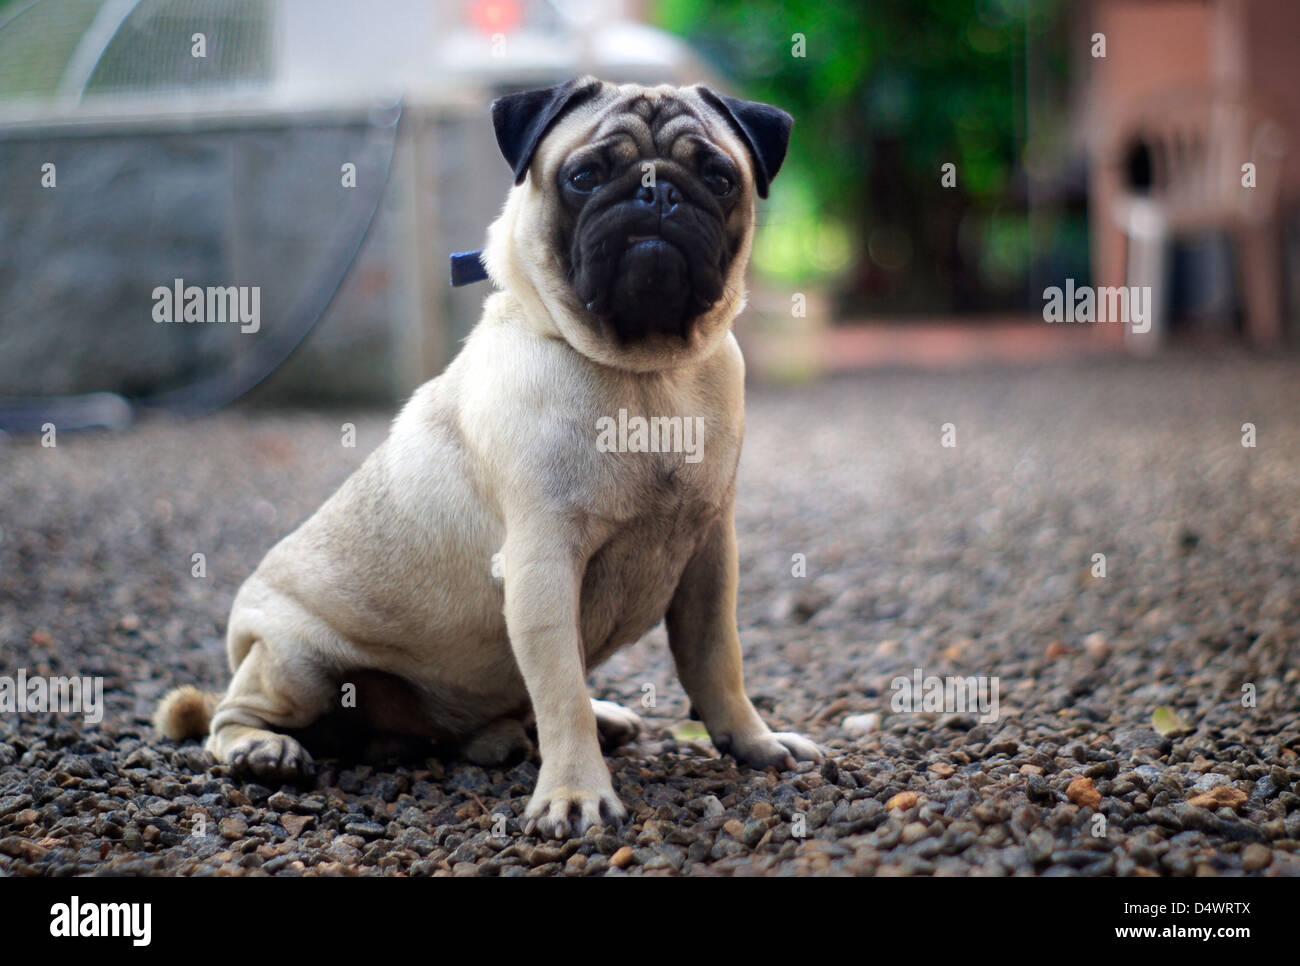 A PUG Dog curiously looking at the camera - Stock Image